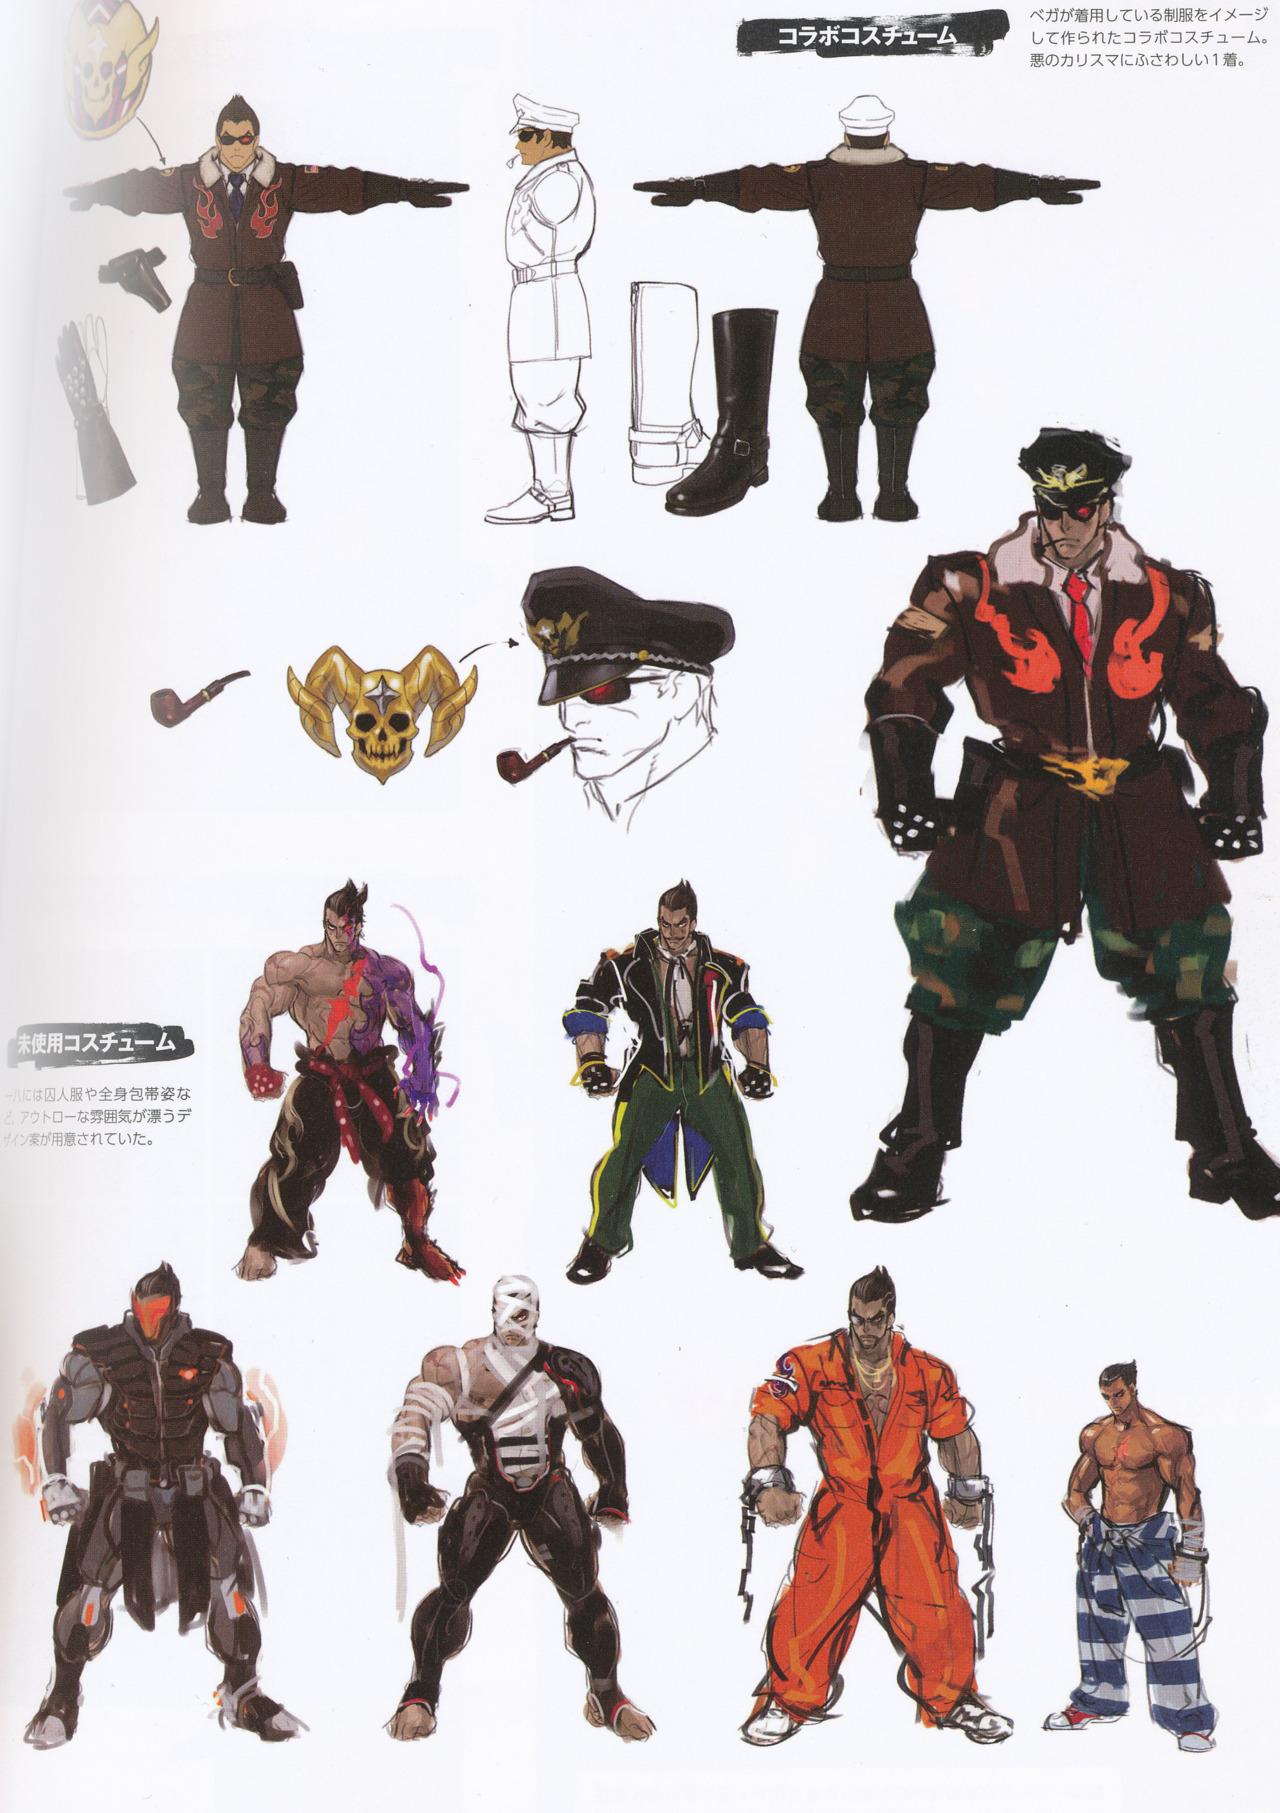 Street Fighter X Tekken: Juri Swap Costume 2012 pc game Img-2